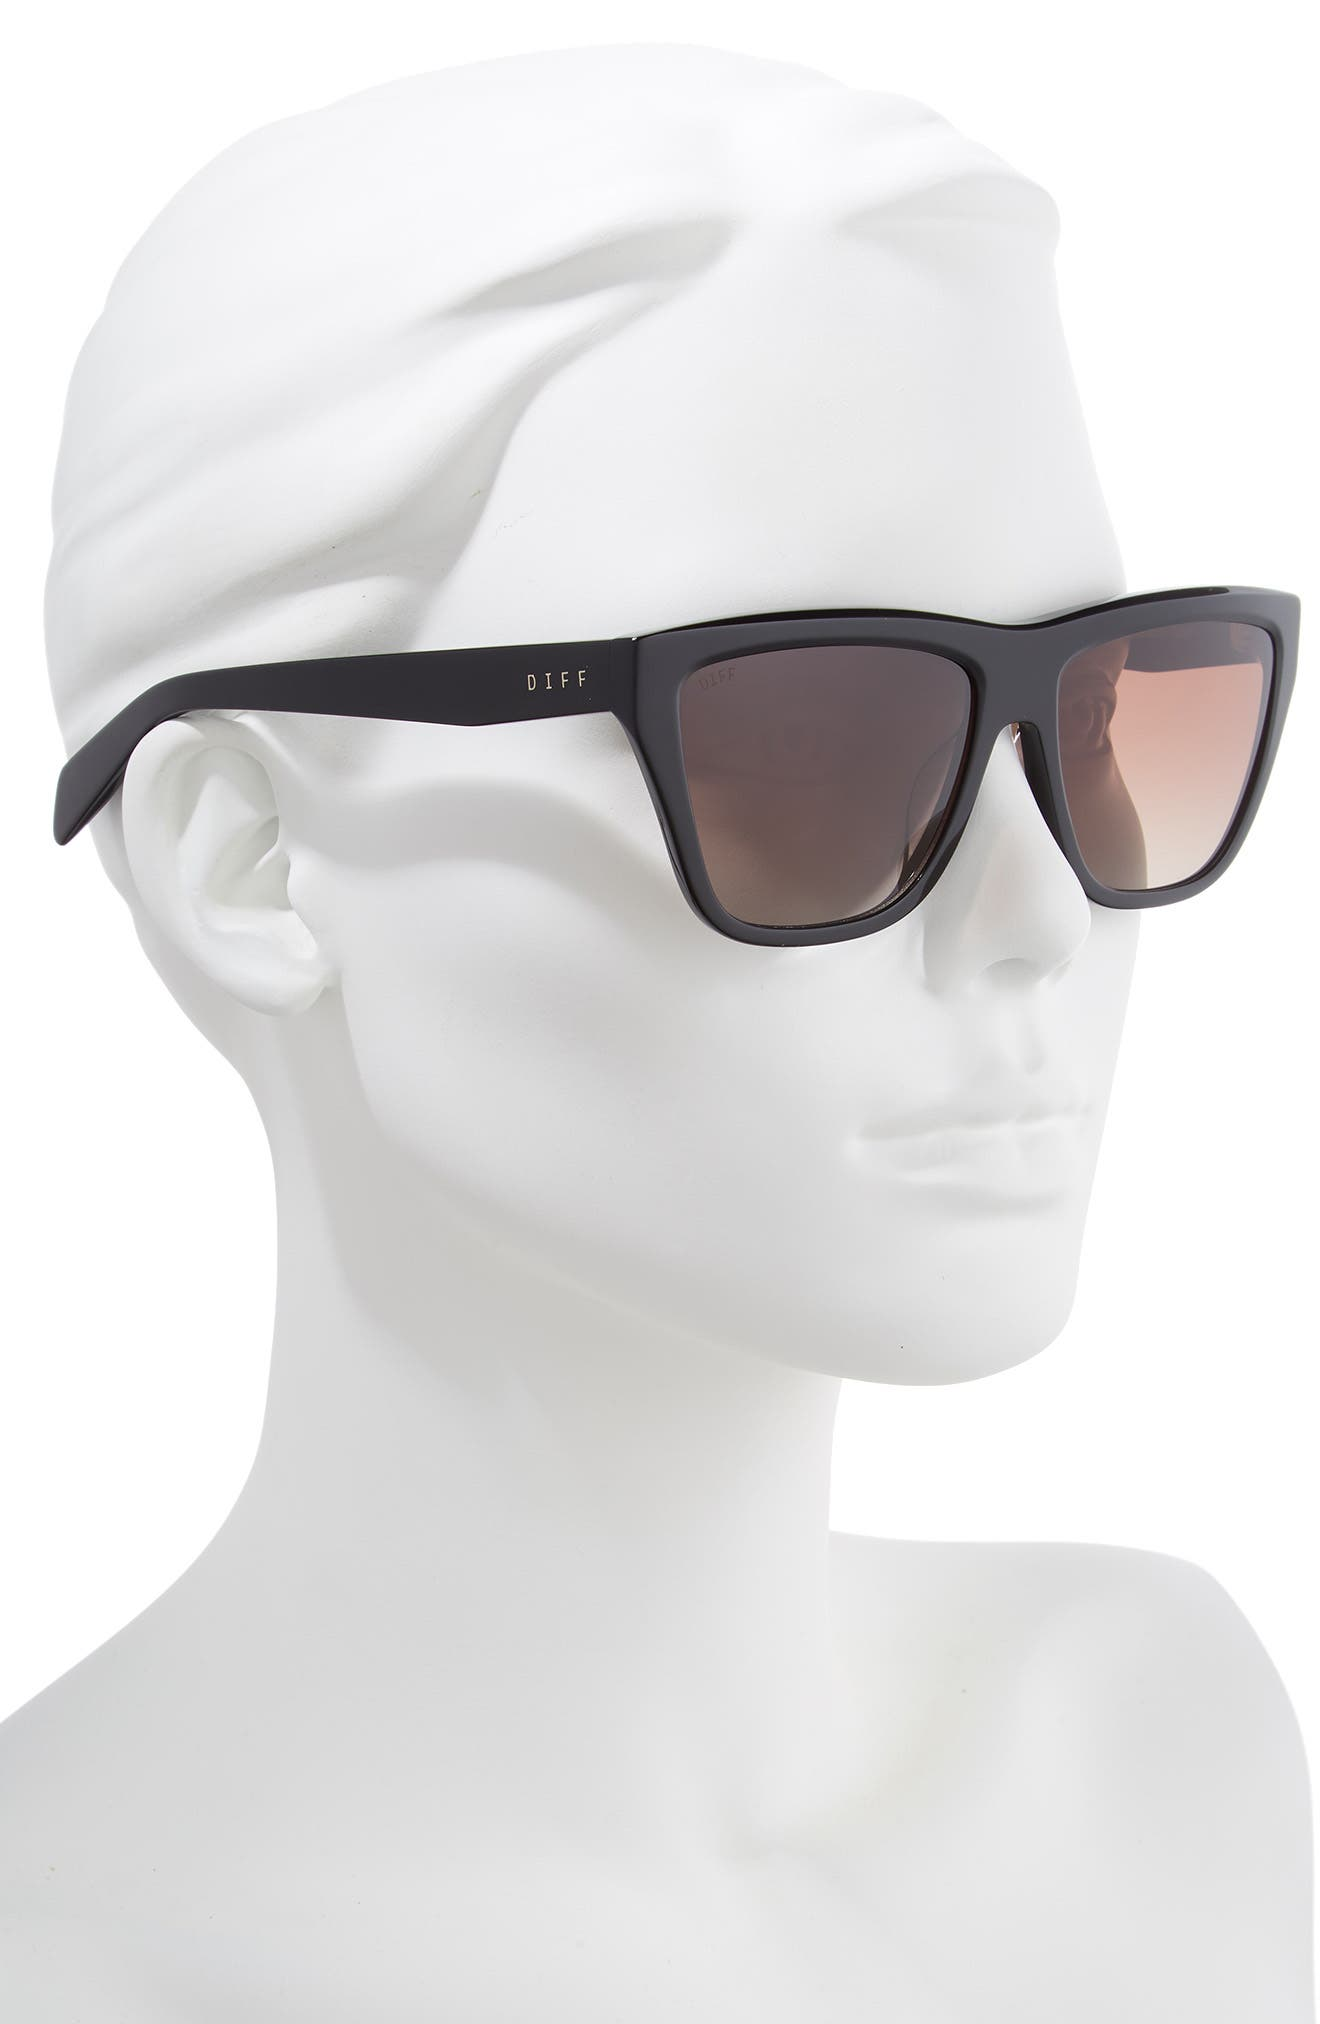 Harper 57mm Polarized Gradient Sunglasses,                             Alternate thumbnail 2, color,                             BLACK/ BROWN